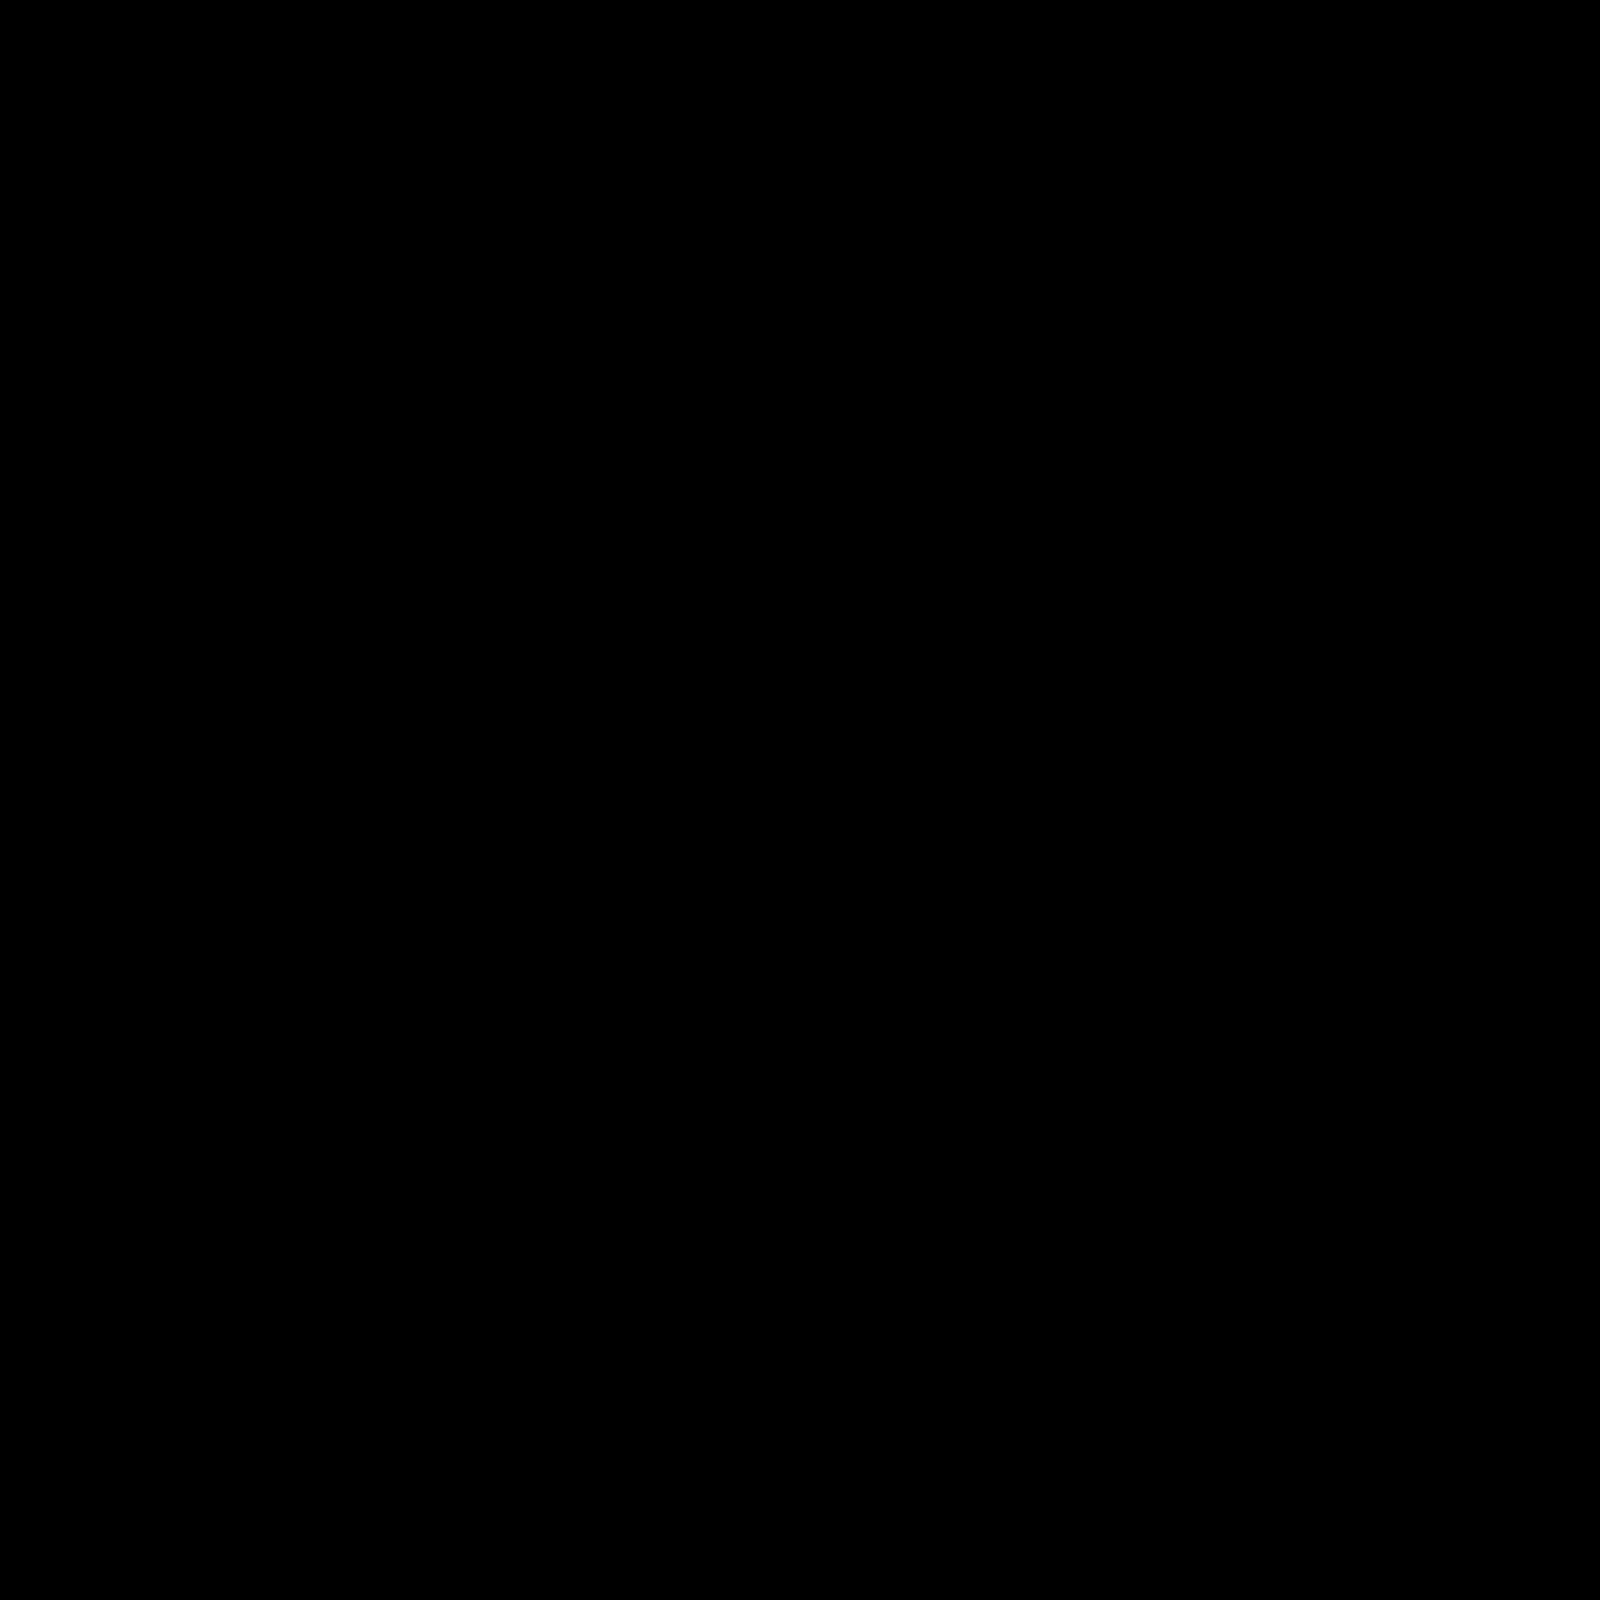 Мозговой штурм icon